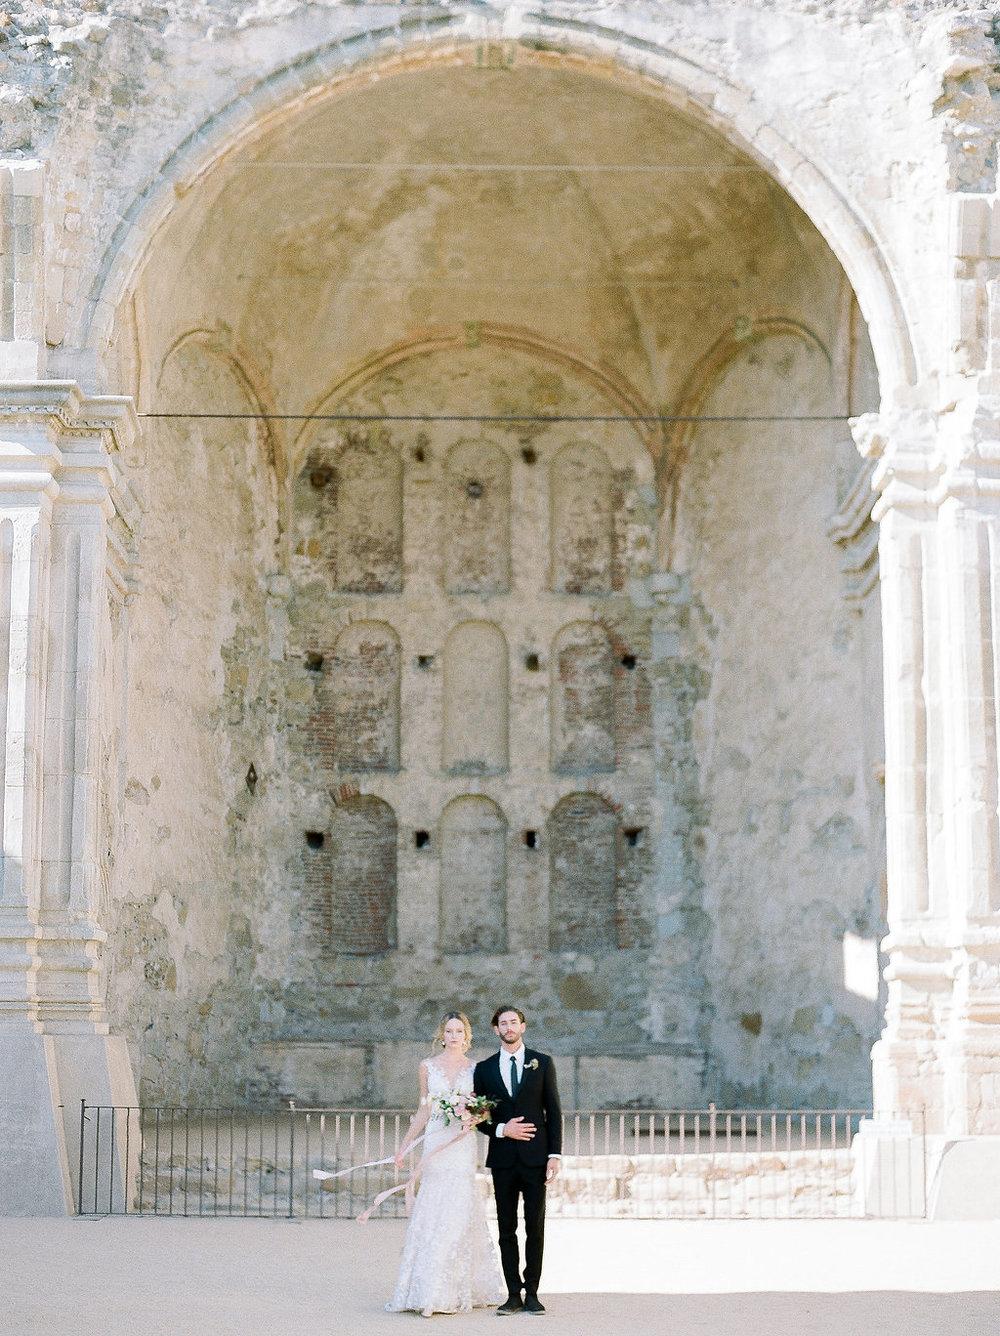 Spanish Mission Style Wedding Ideas Summer Flowers Finding Flora San Juan Capistrano European Venues California Bride and Groom